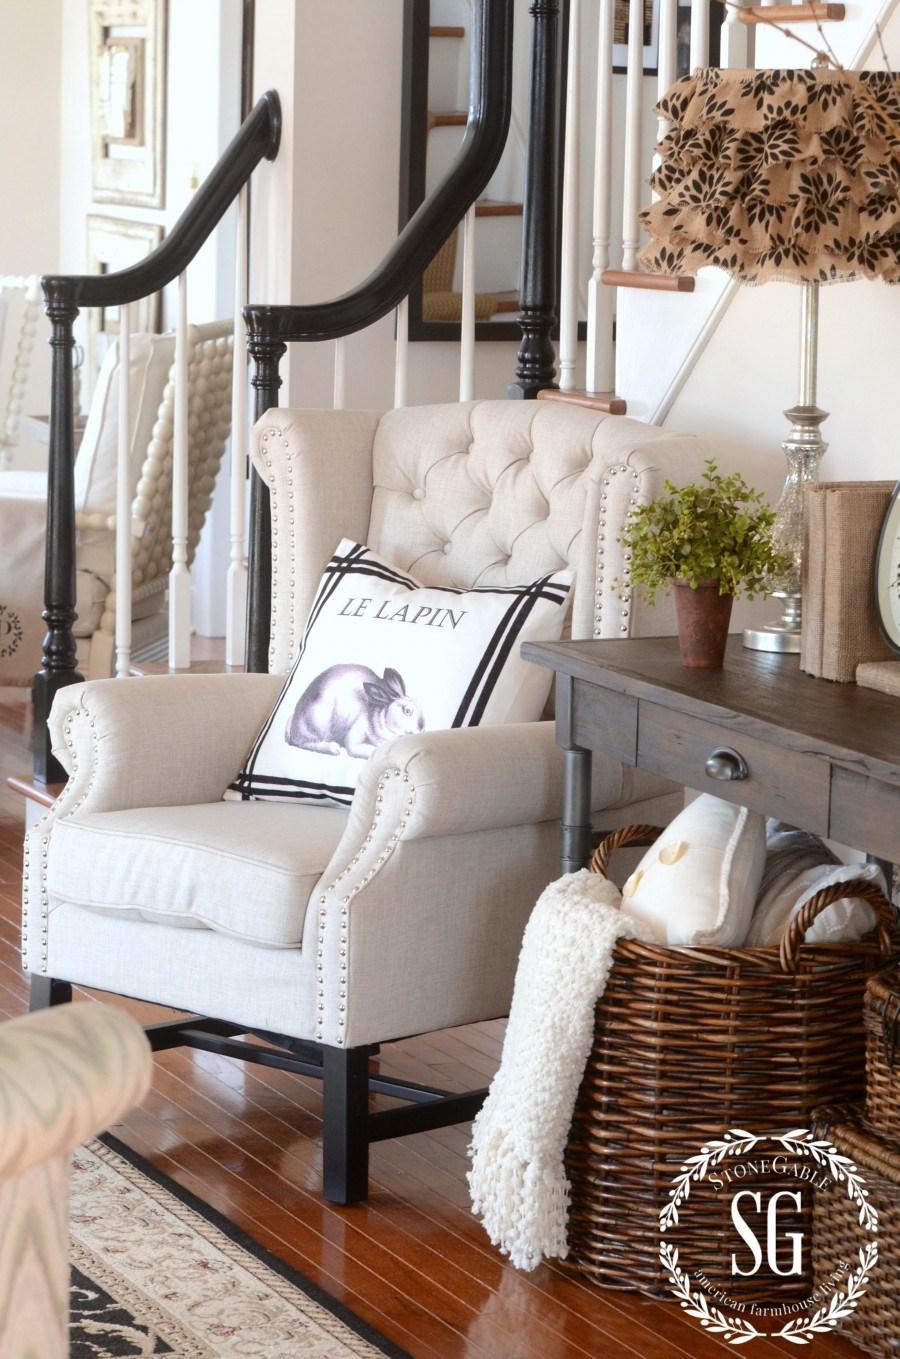 Small Foyer Stool : Elegant ways to give your entryway farmhouse style